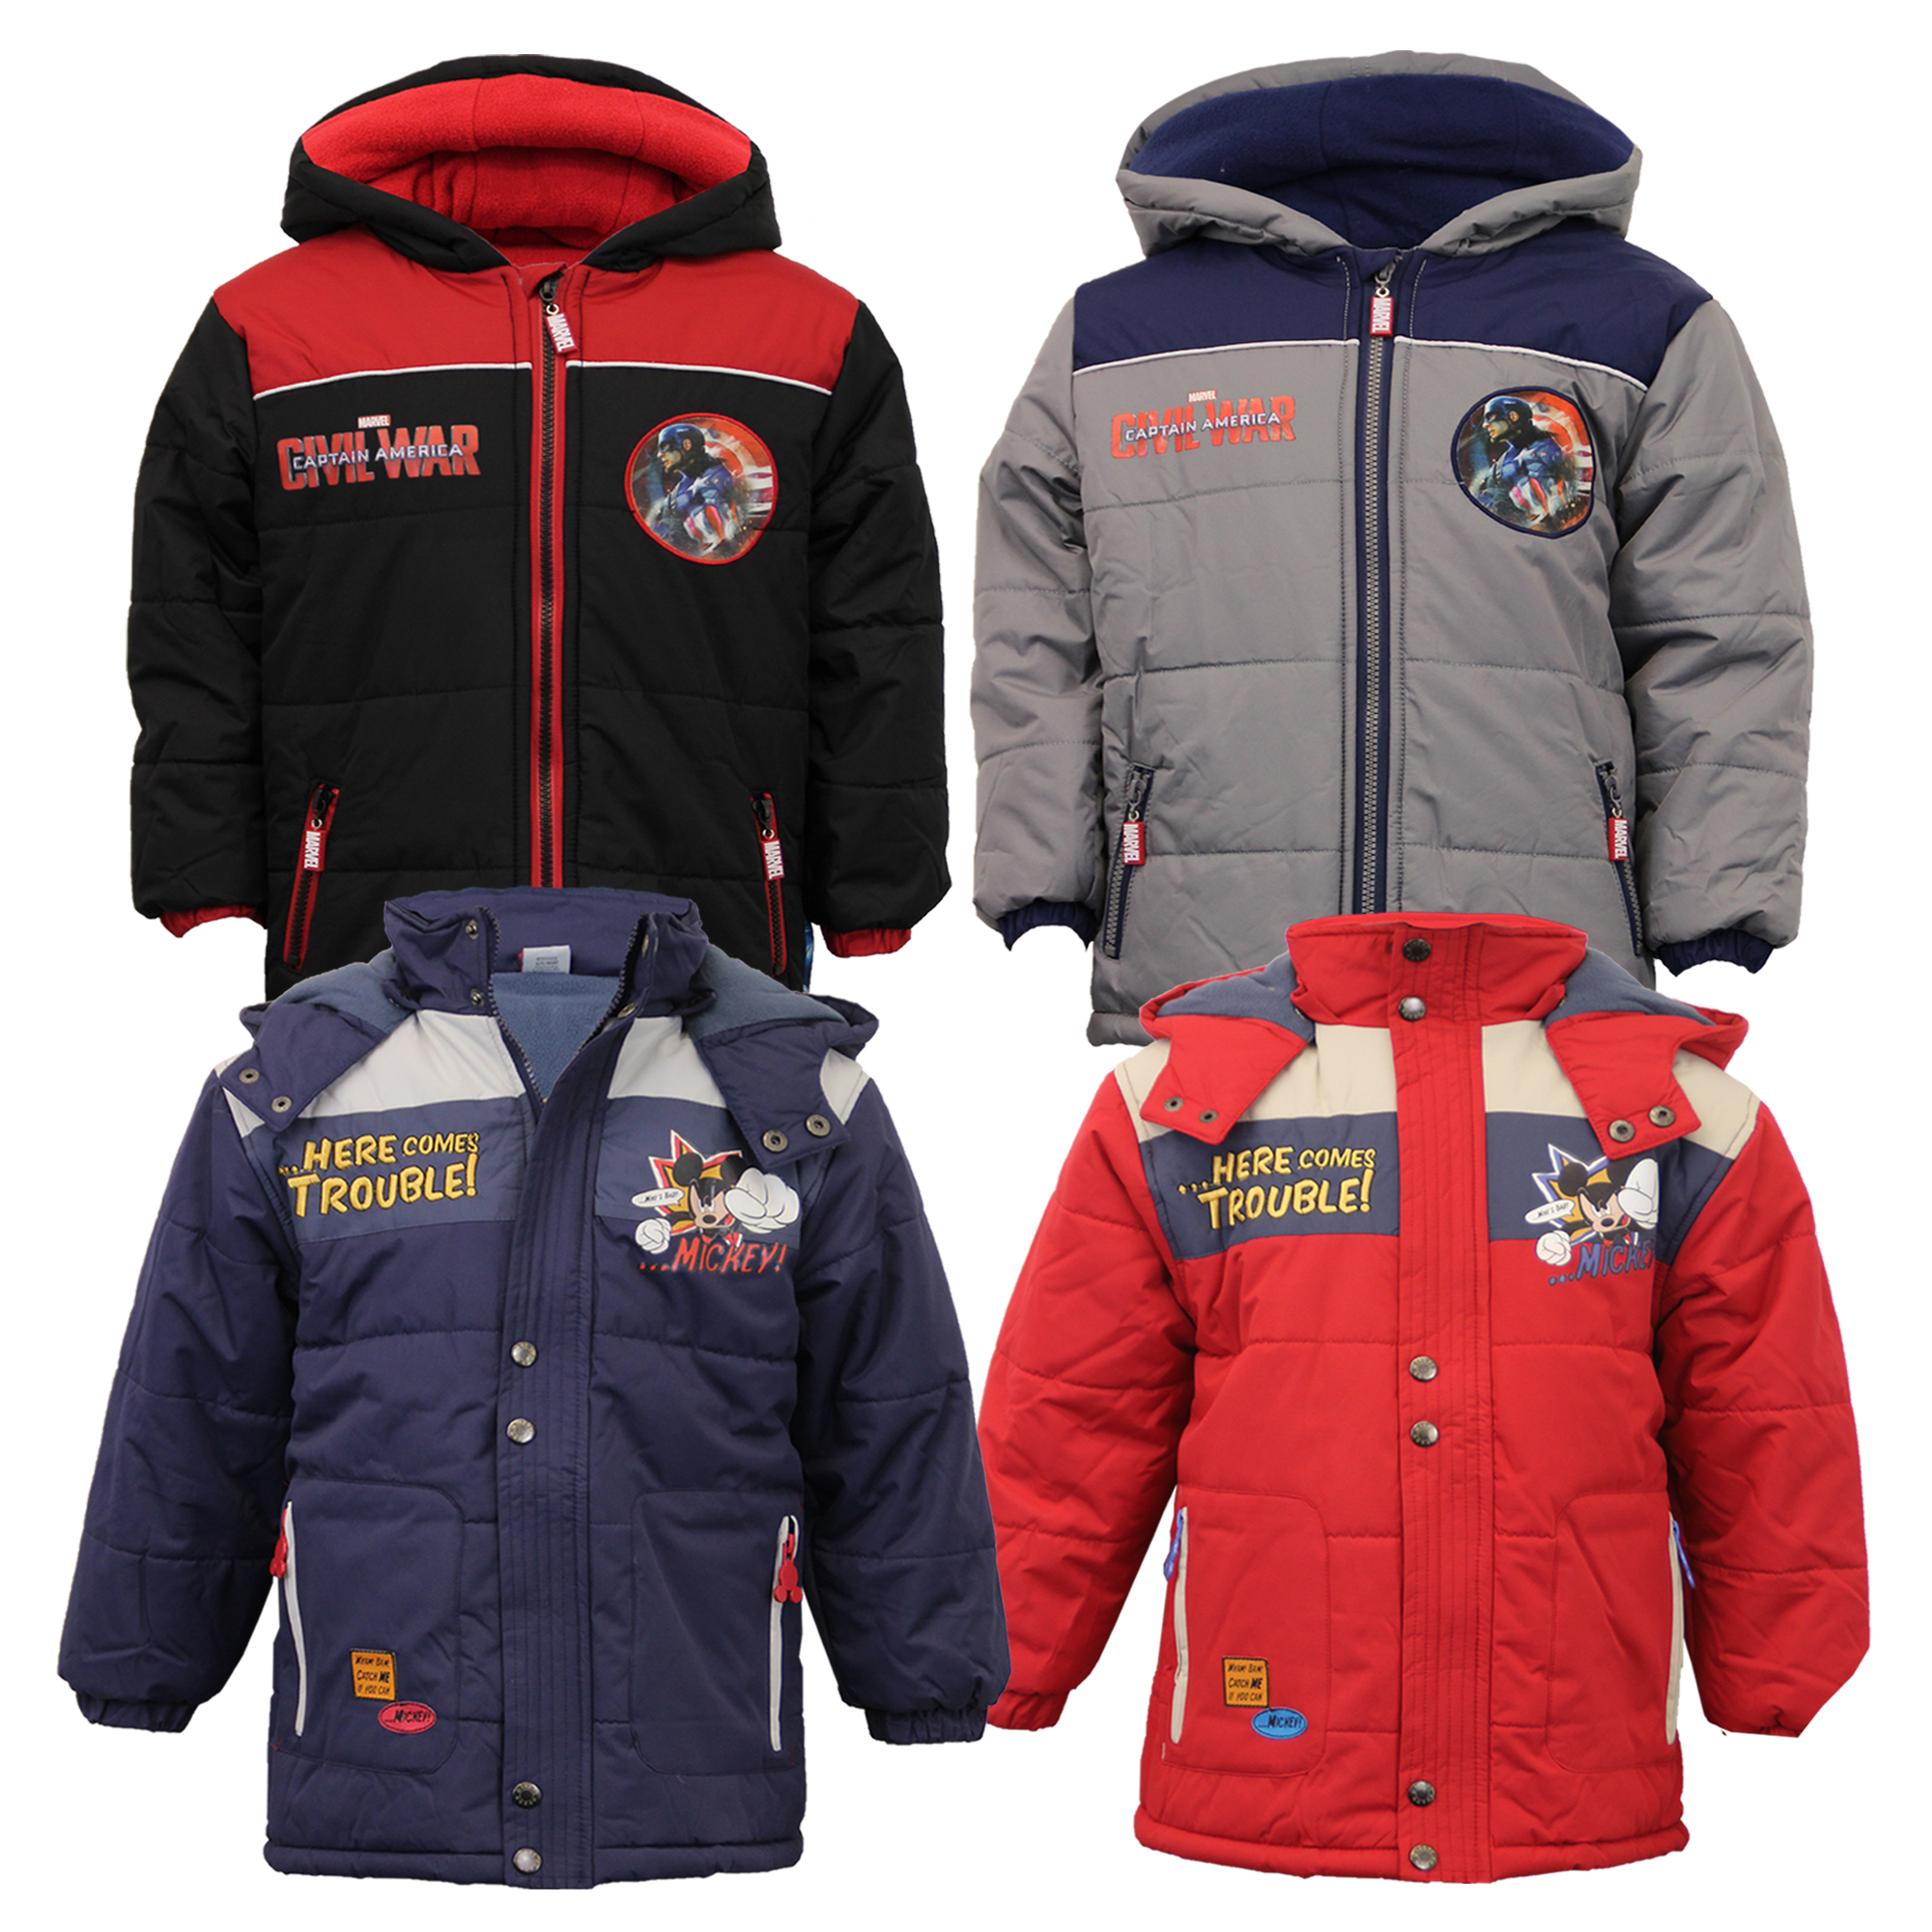 buy online 1ab19 18f5b Details zu Jungen Captain America Spiderman Jacke Kinder Gepolstert Marvel  Disney